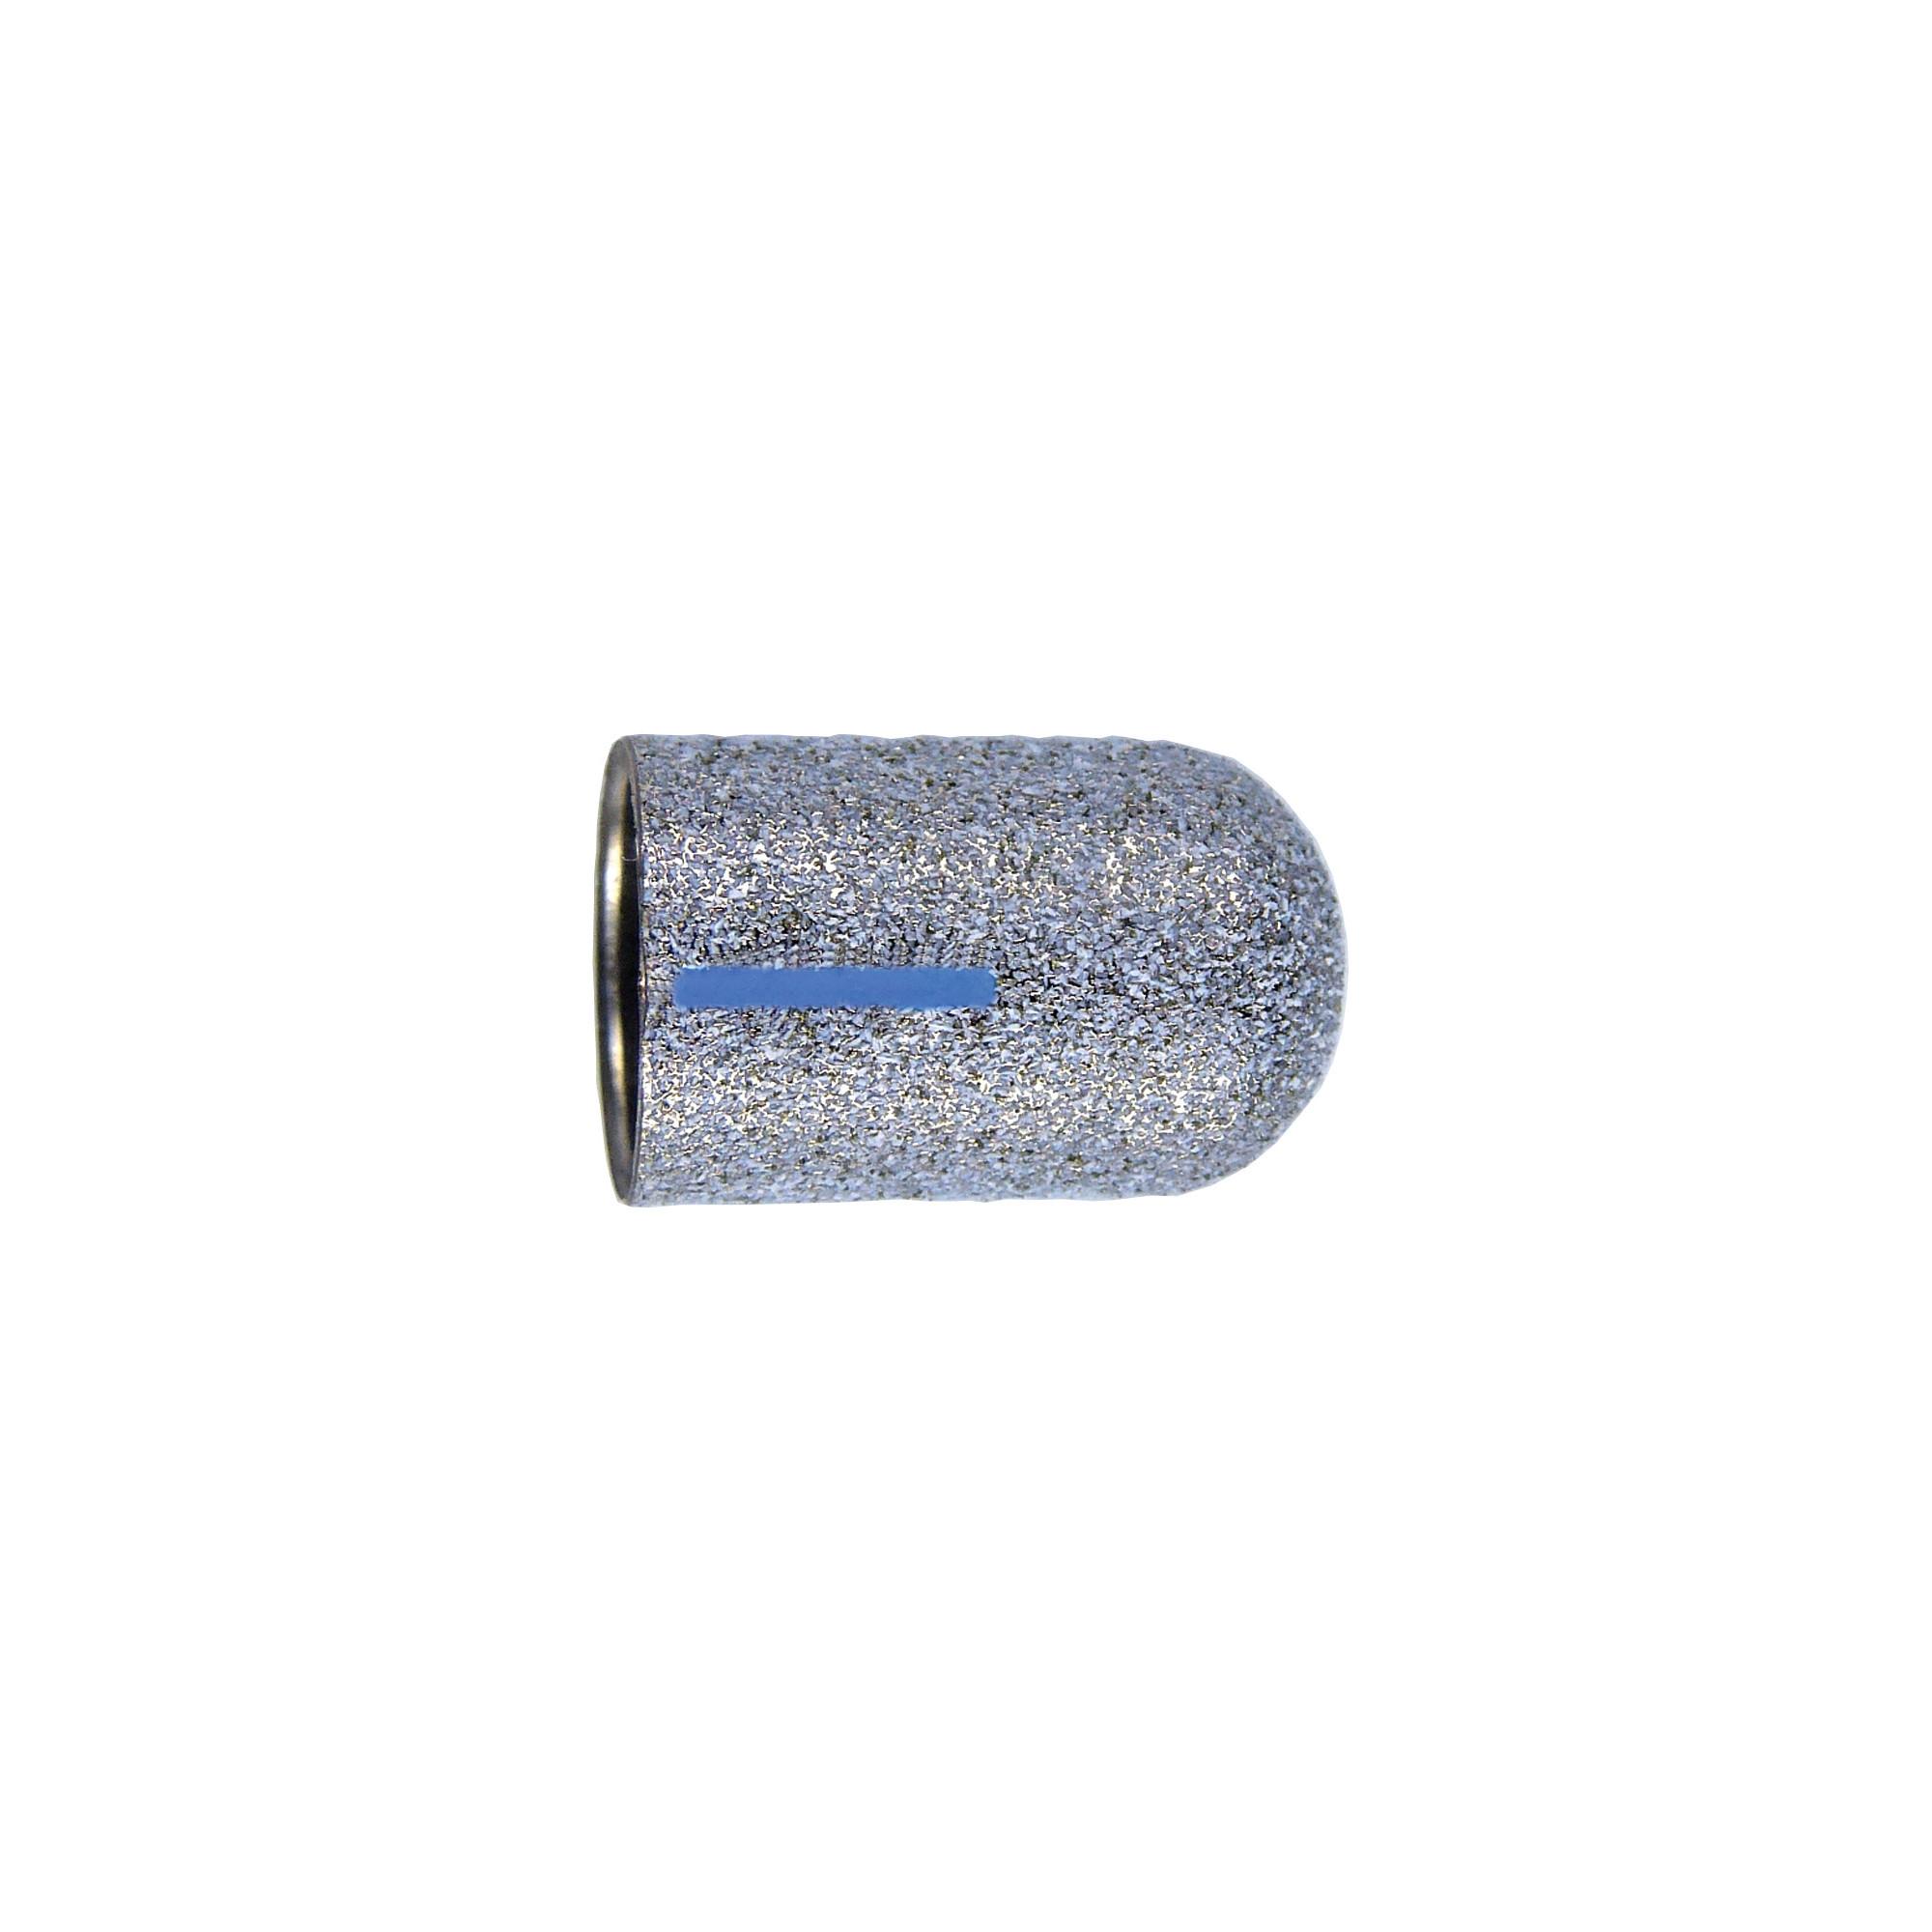 Fraise HybridCap HC880M - Diamant - Abrasiondescallositésdurs - 9,5 mm